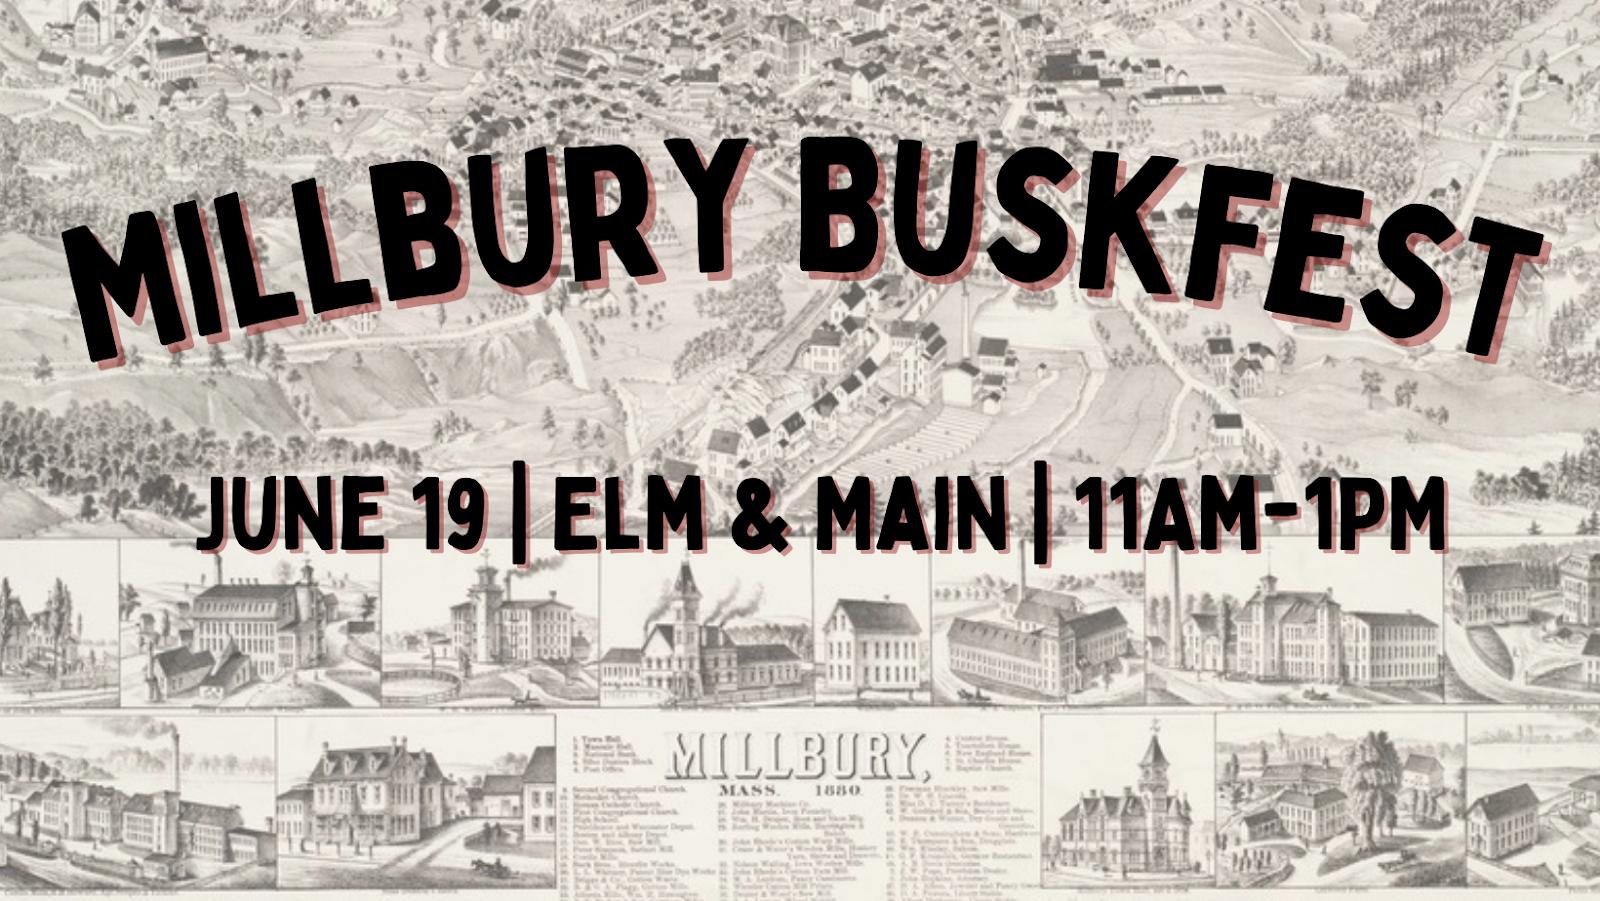 MILLBURY BUSKFEST: A CELEBRATION OF LOCAL MUSIC SINCE 2021